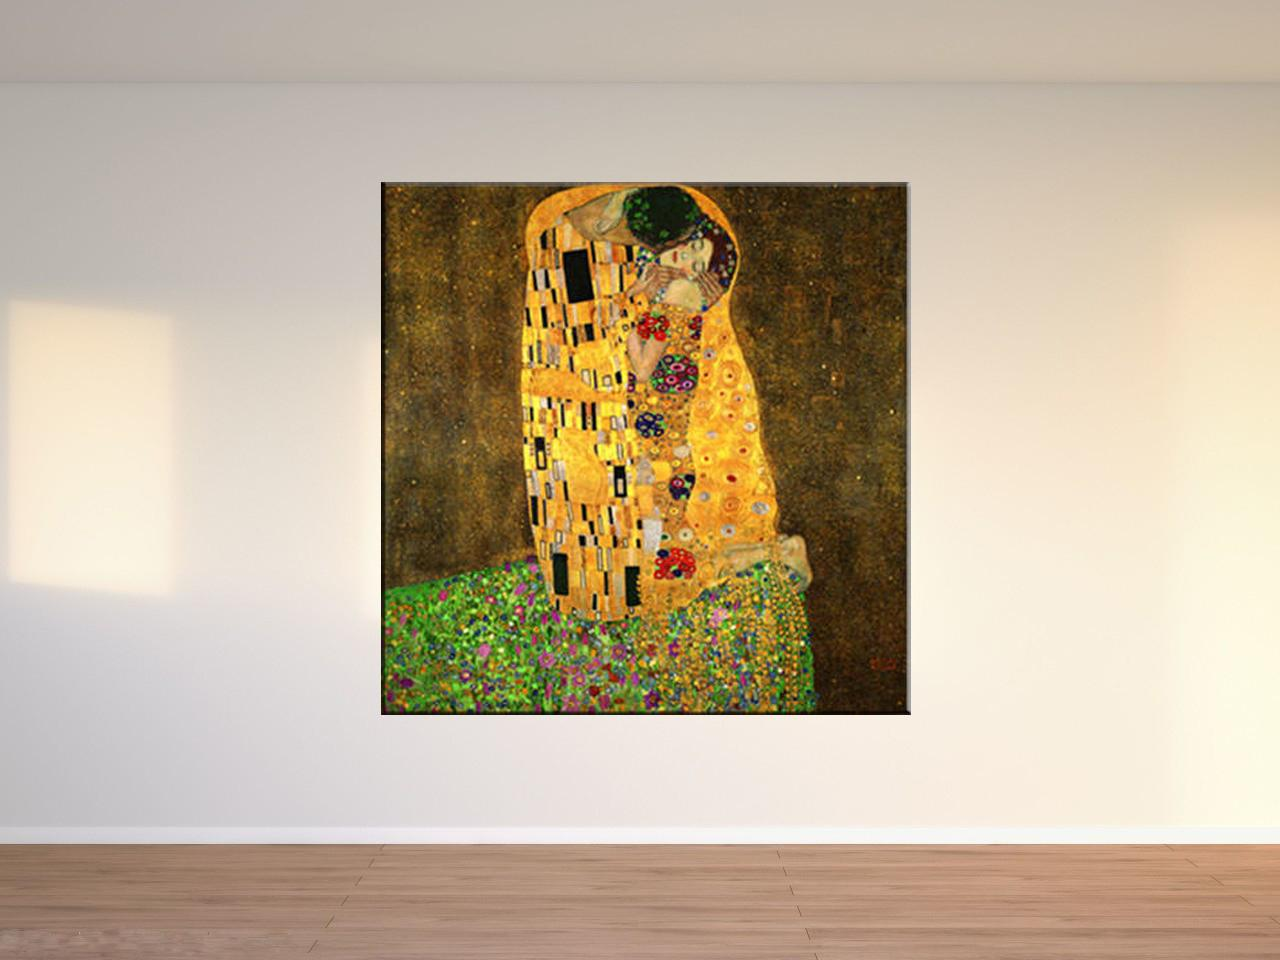 Kiss Gustav Klimt , Canvas Pieces Home Decor HD Printed Modern Art Painting on Canvas (Unframed/Framed)